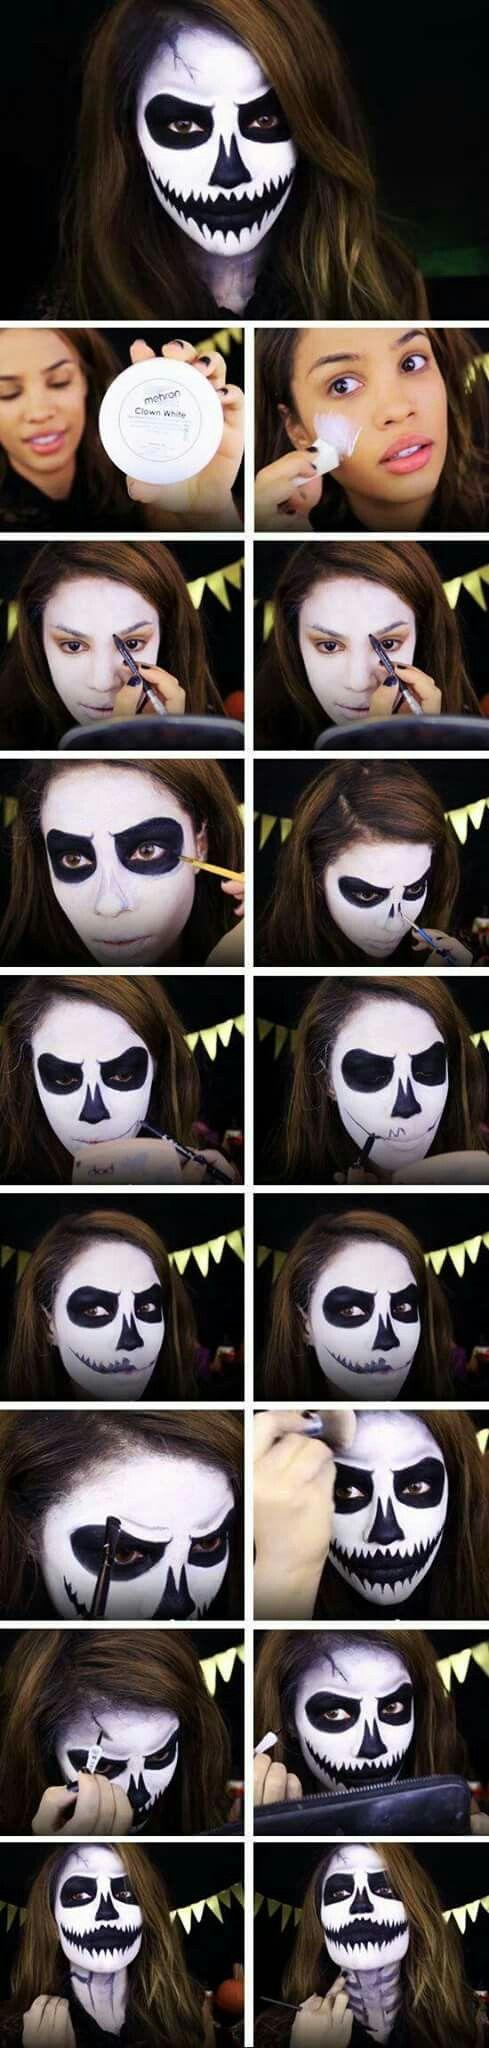 112 best maquillaje halloween images on Pinterest